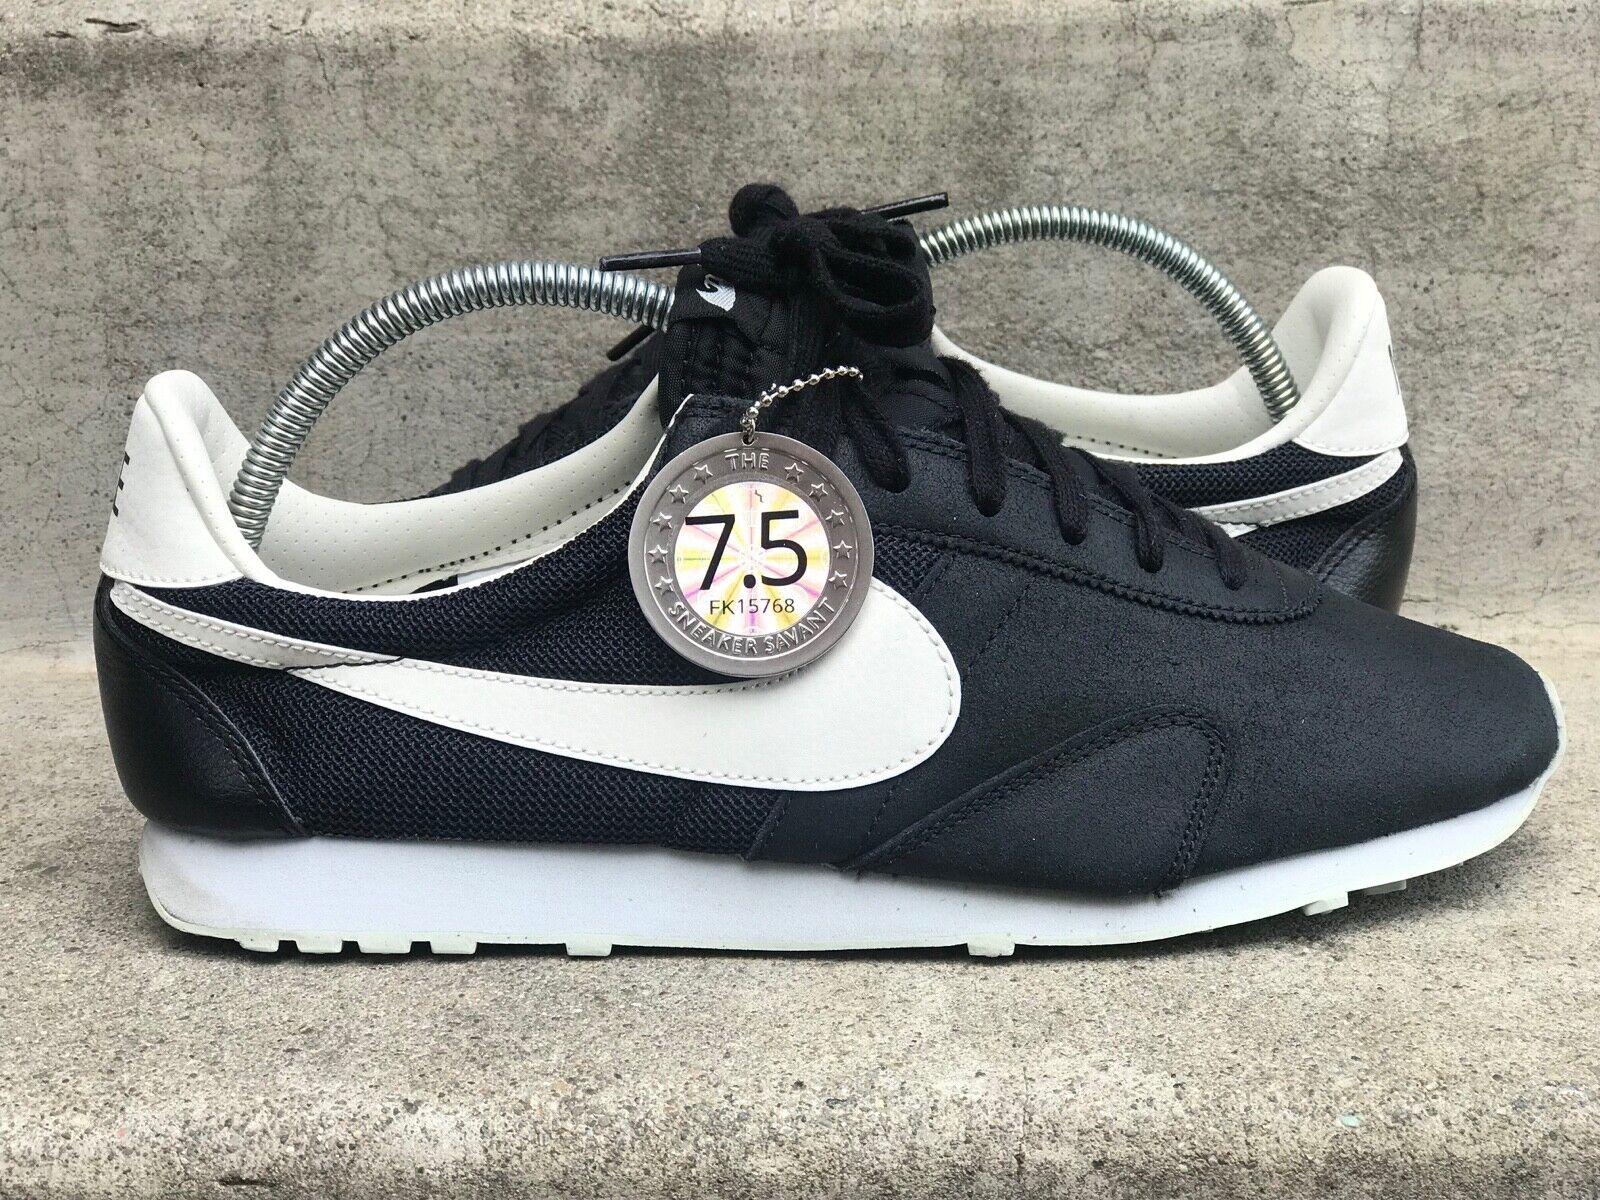 2014 Nike Pre Montreal Vintage Racer WMNS sz 11w 9.5 Sneaker Savant Grade 7.5 10